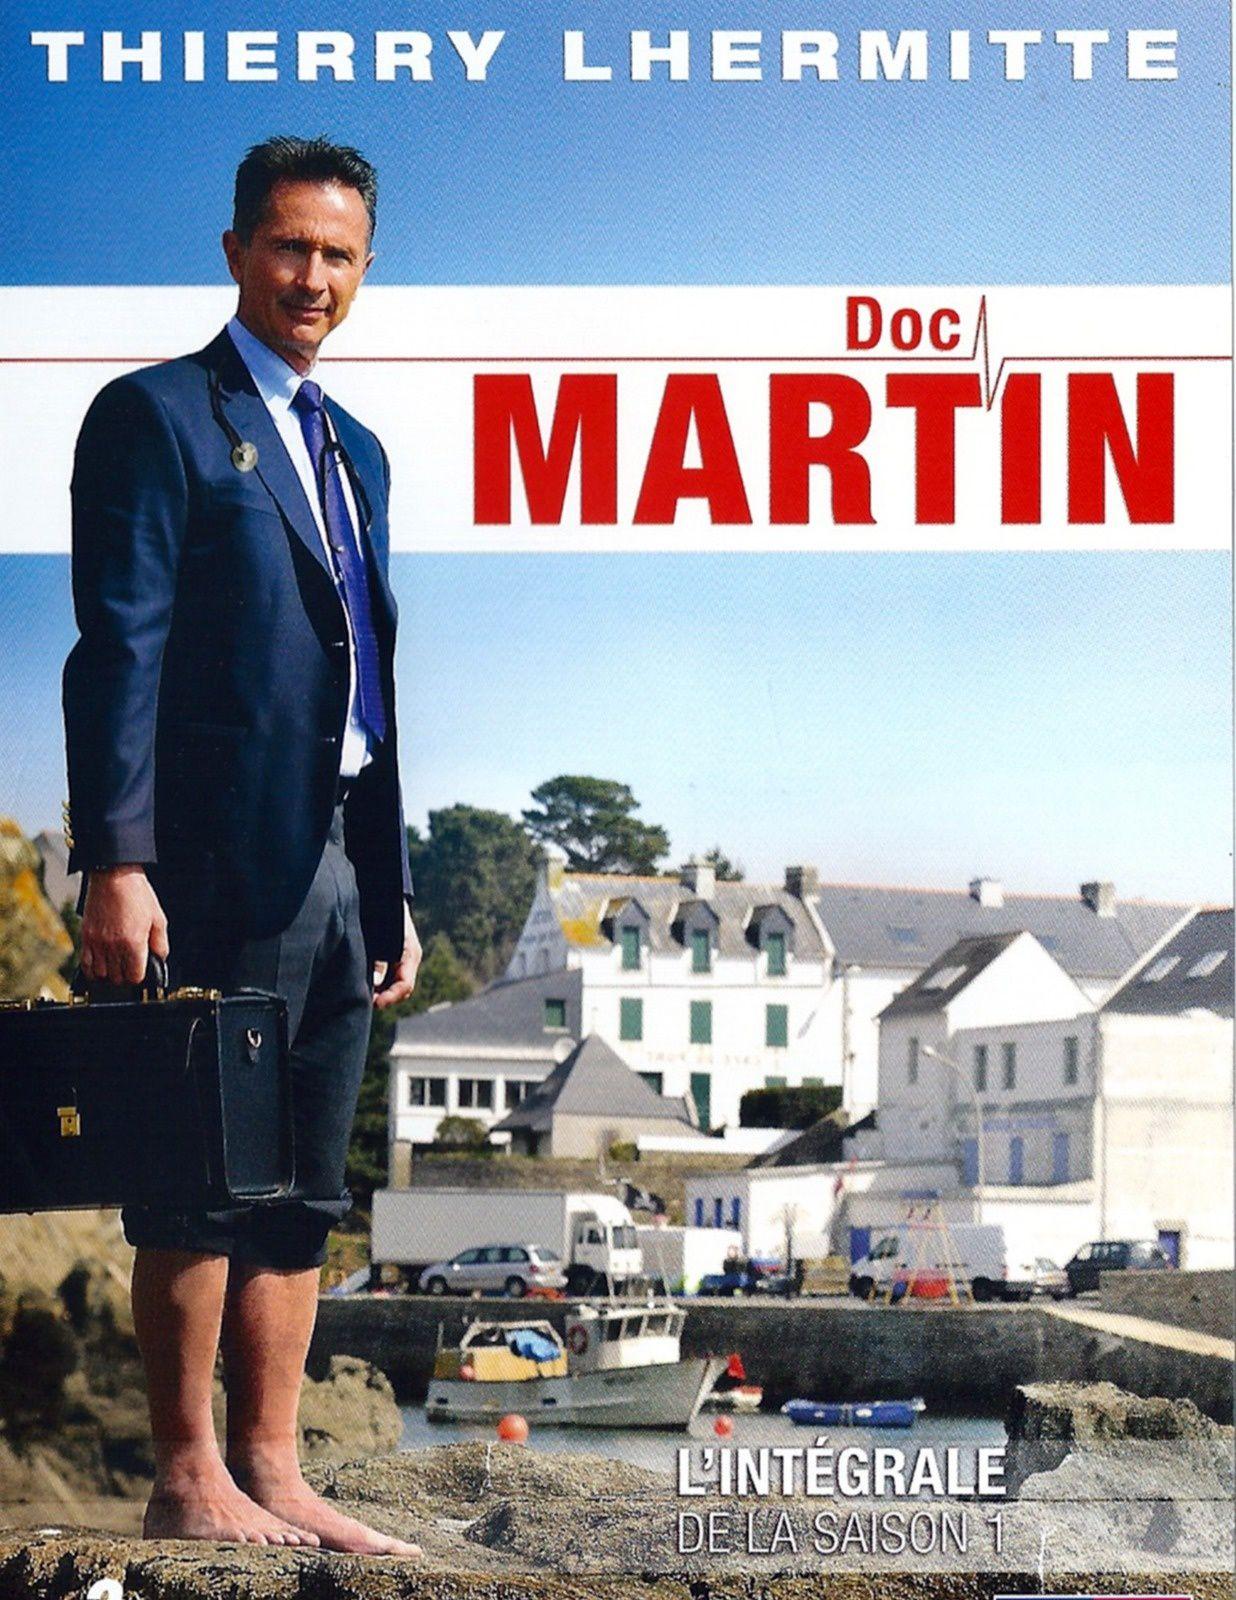 FAIS DU BIEN A MARTIN...